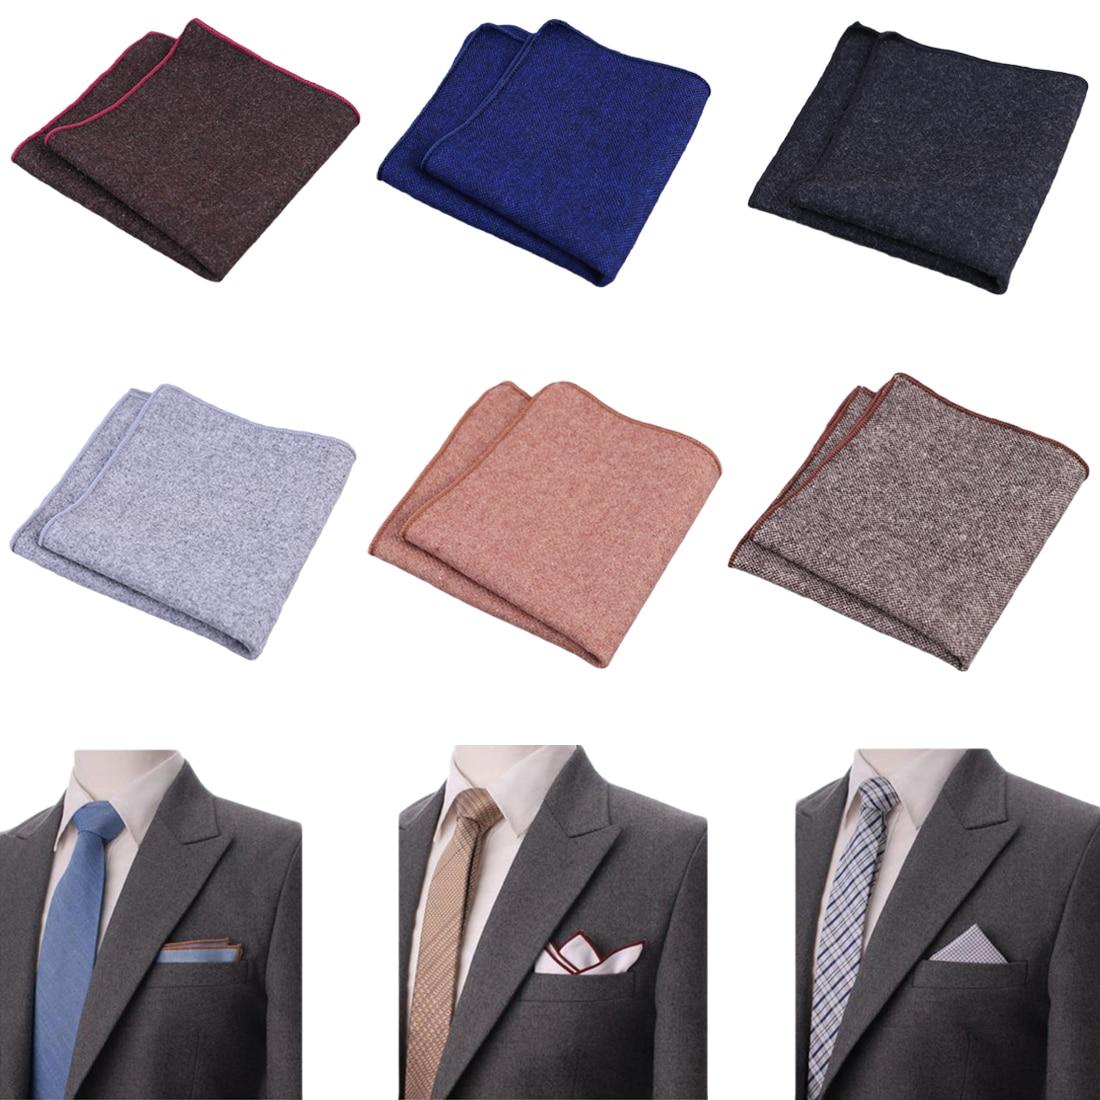 New Hankerchief Scarves Vintage Wool Hankies Men's Pocket Square Handkerchiefs Striped Solid Cotton 23*23cm